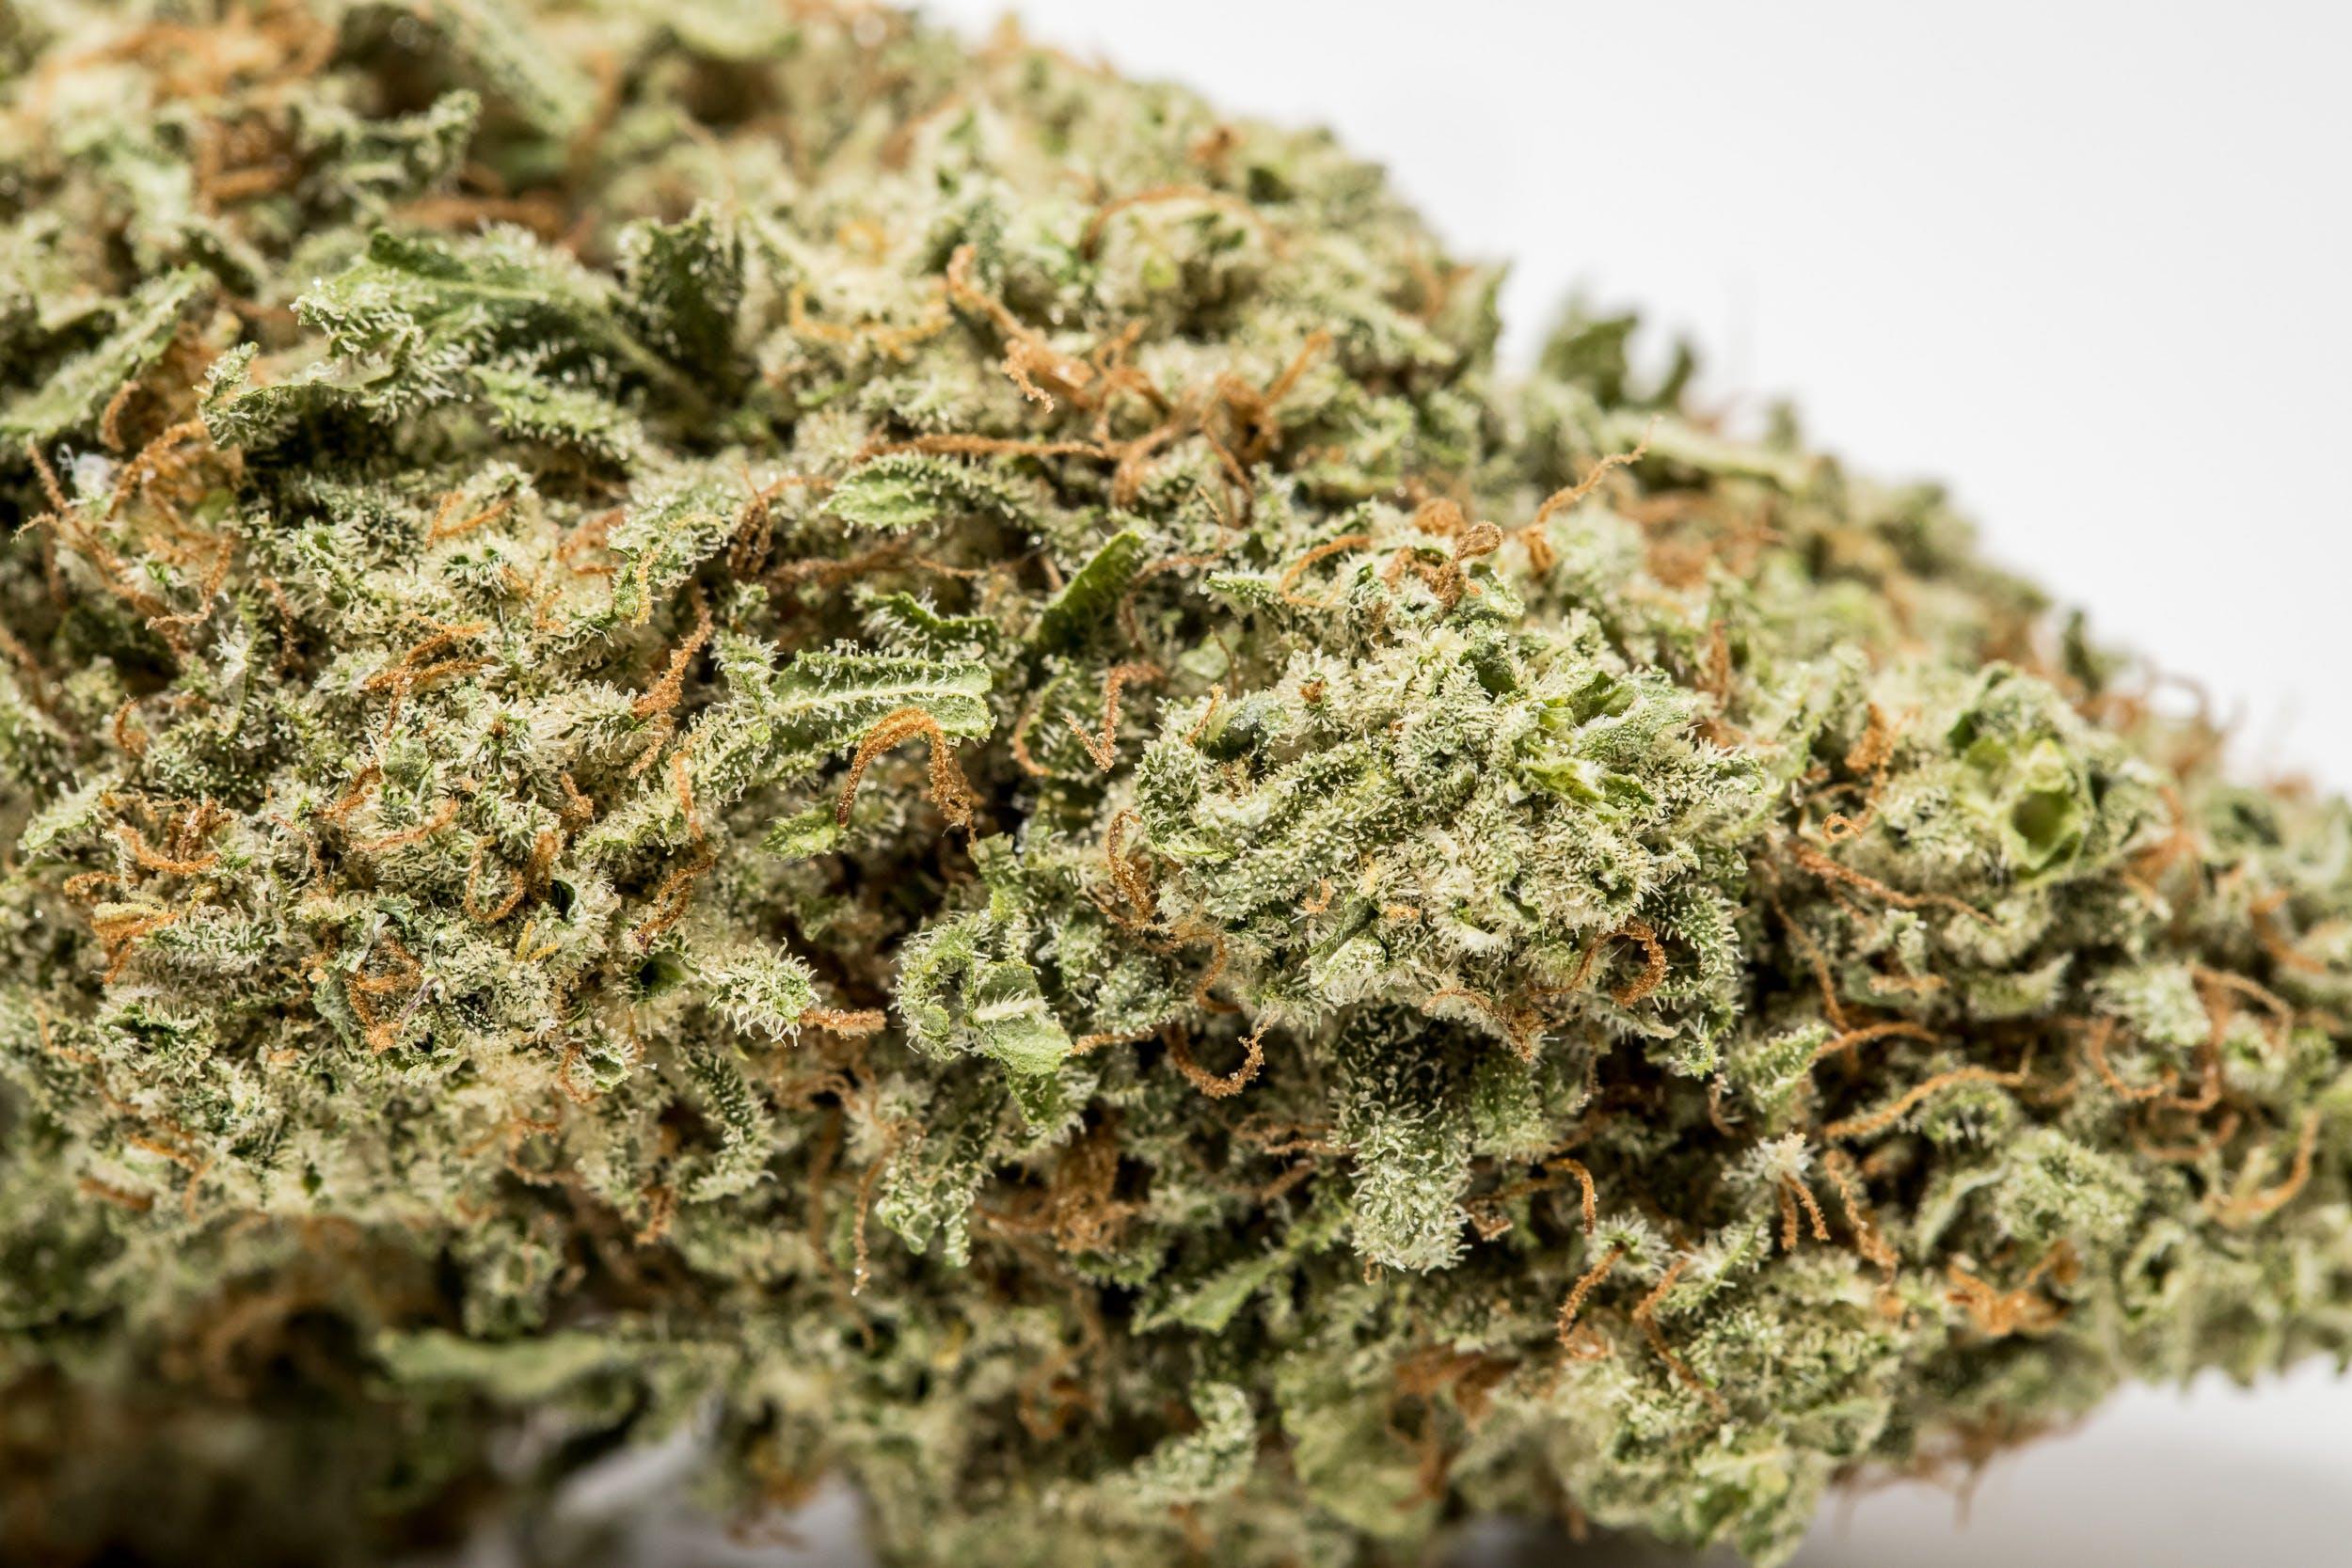 Pineapple Weed; Pineapple Cannabis Strain; Pineapple Hybrid Marijuana Strain